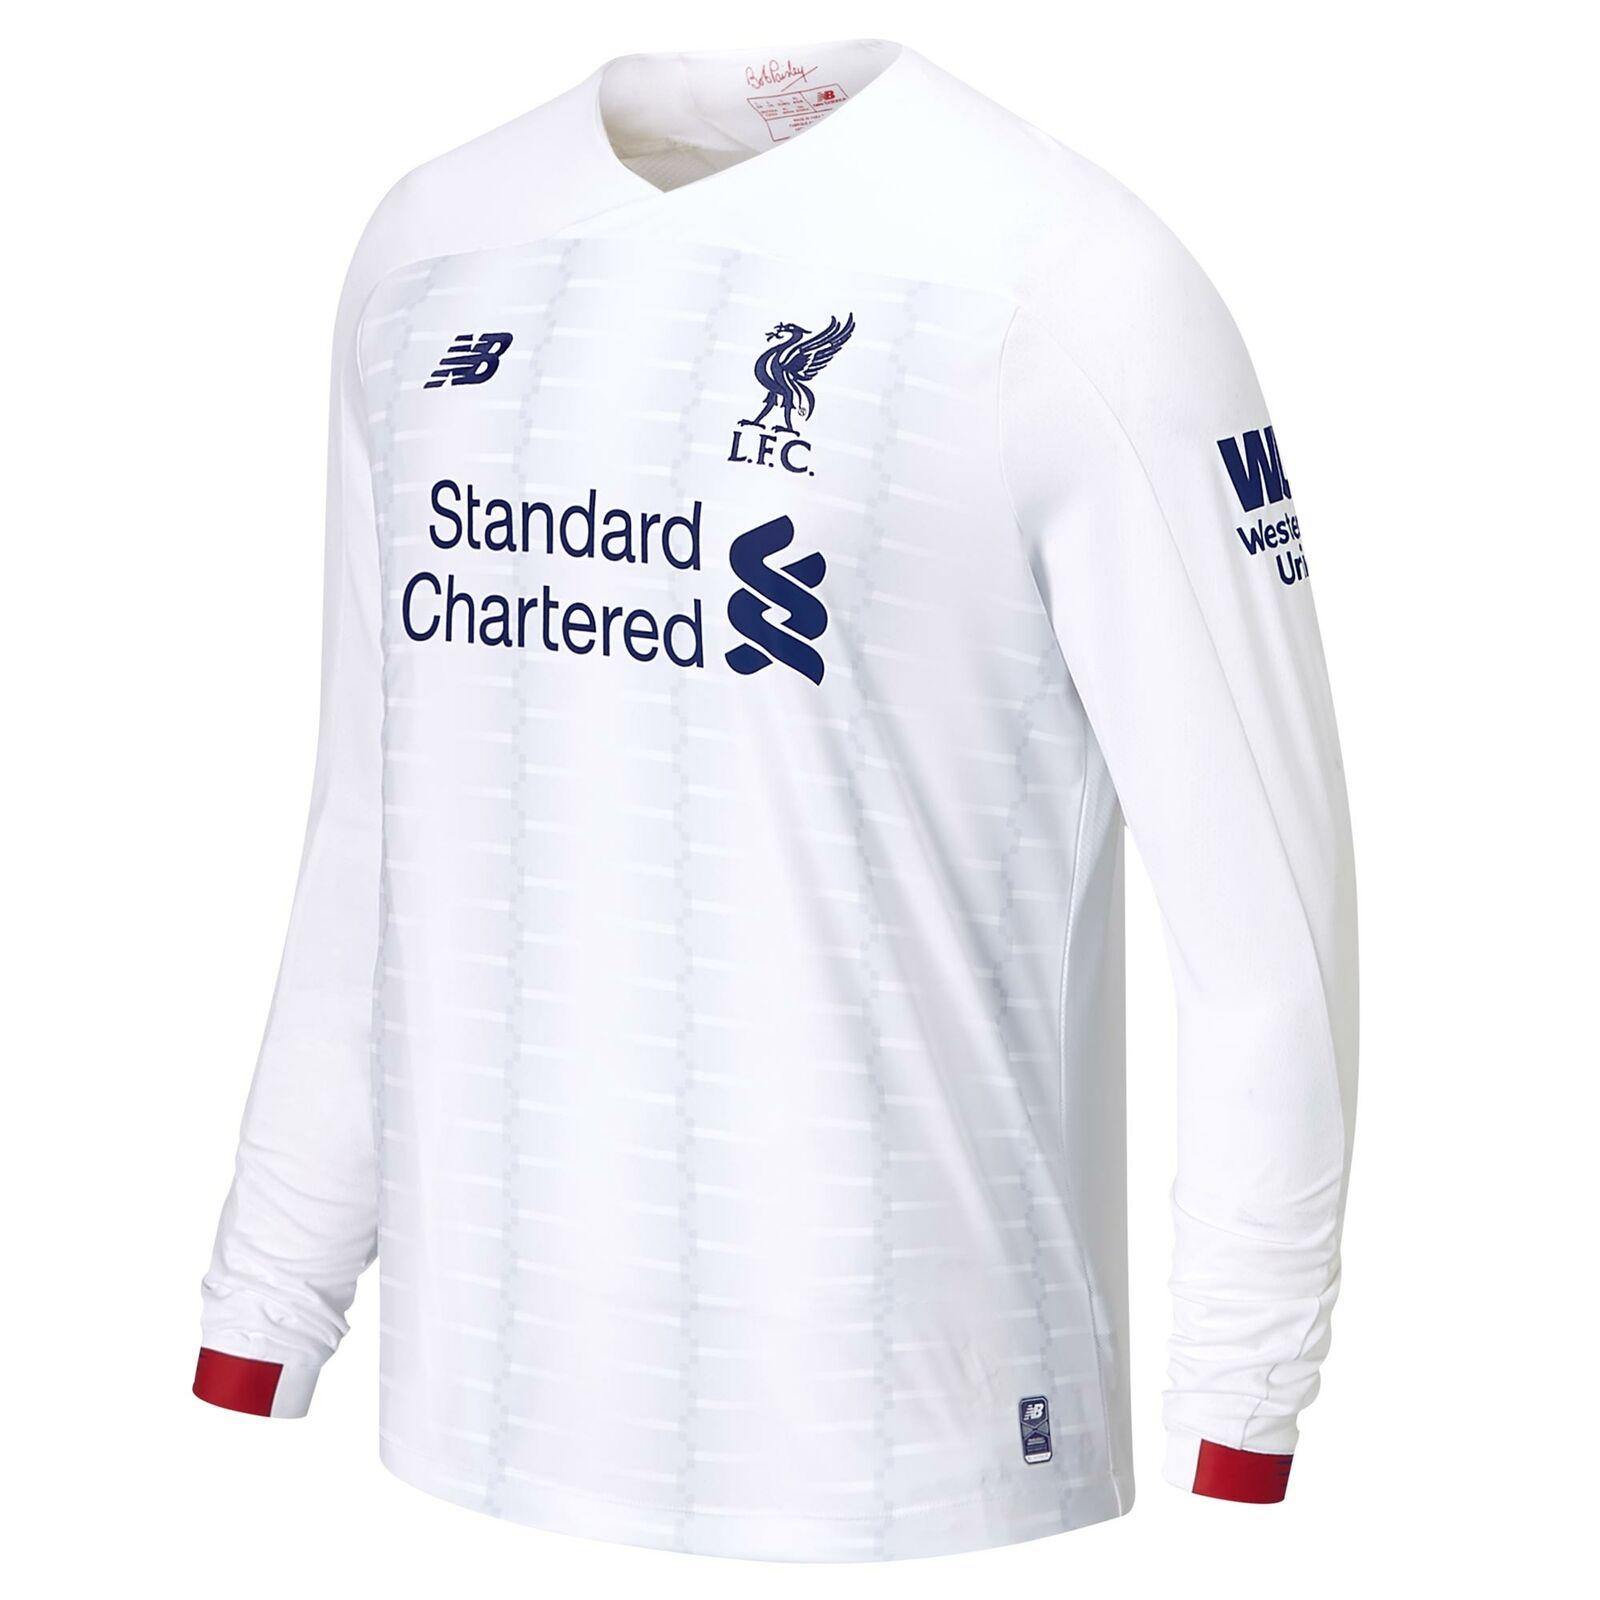 New Equilibrar oficial Liverpool FC Lejos  Camiseta De Fútbol Para Hombre Manga Larga 2019-20  bienvenido a comprar